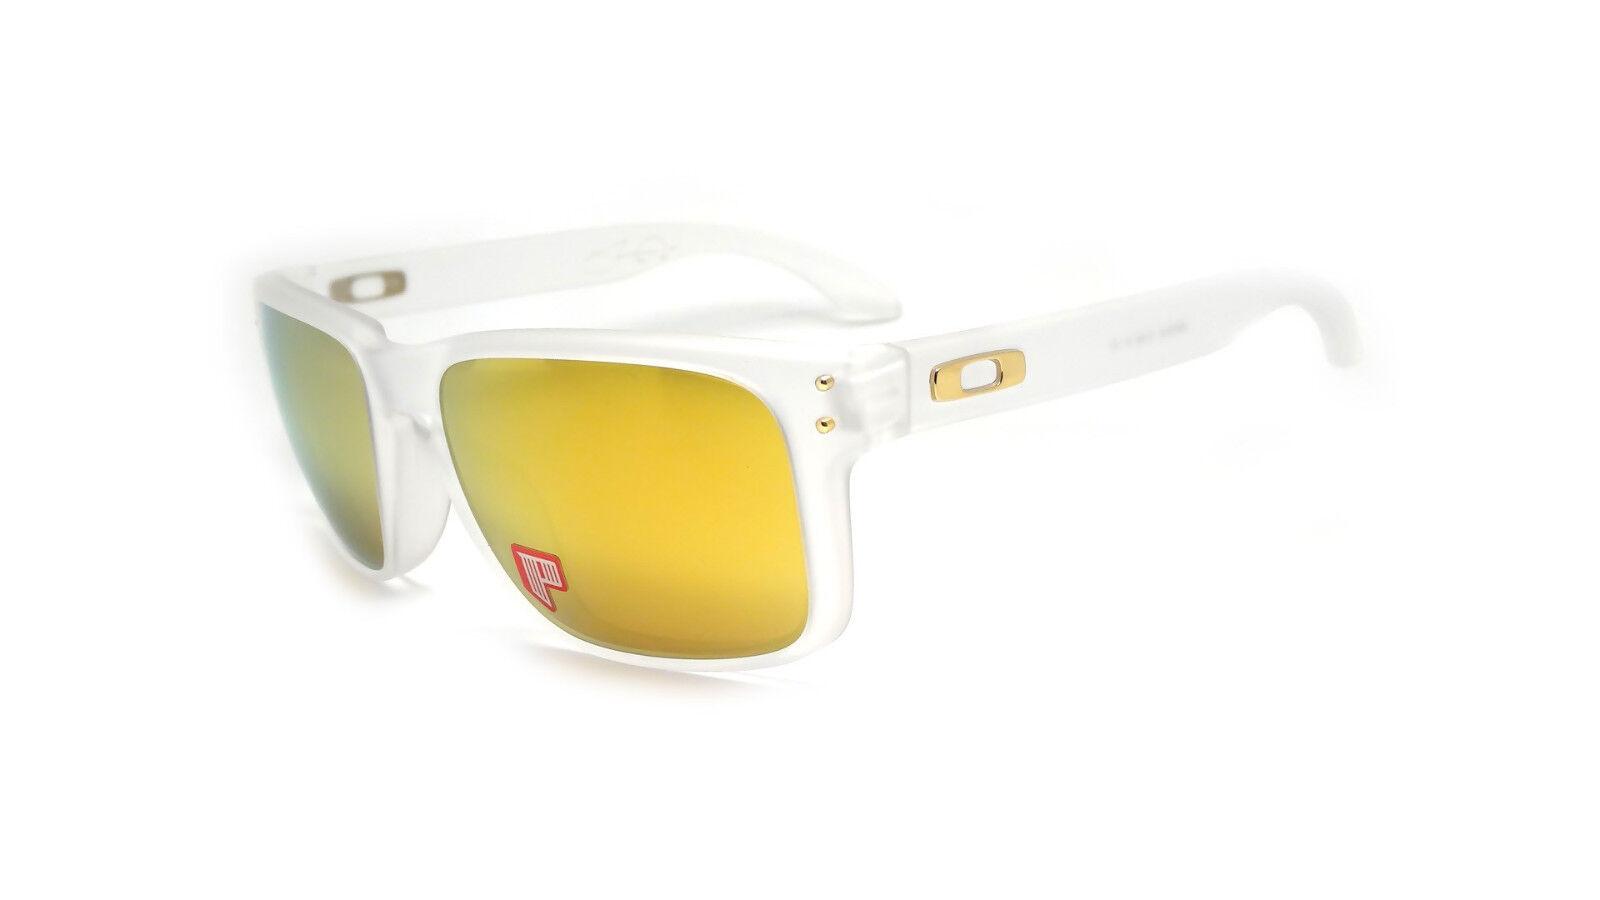 9b4aef74f3eff Oakley Sunglasses Holbrook Shaun White 9102-42 Matte Clear 24k ...